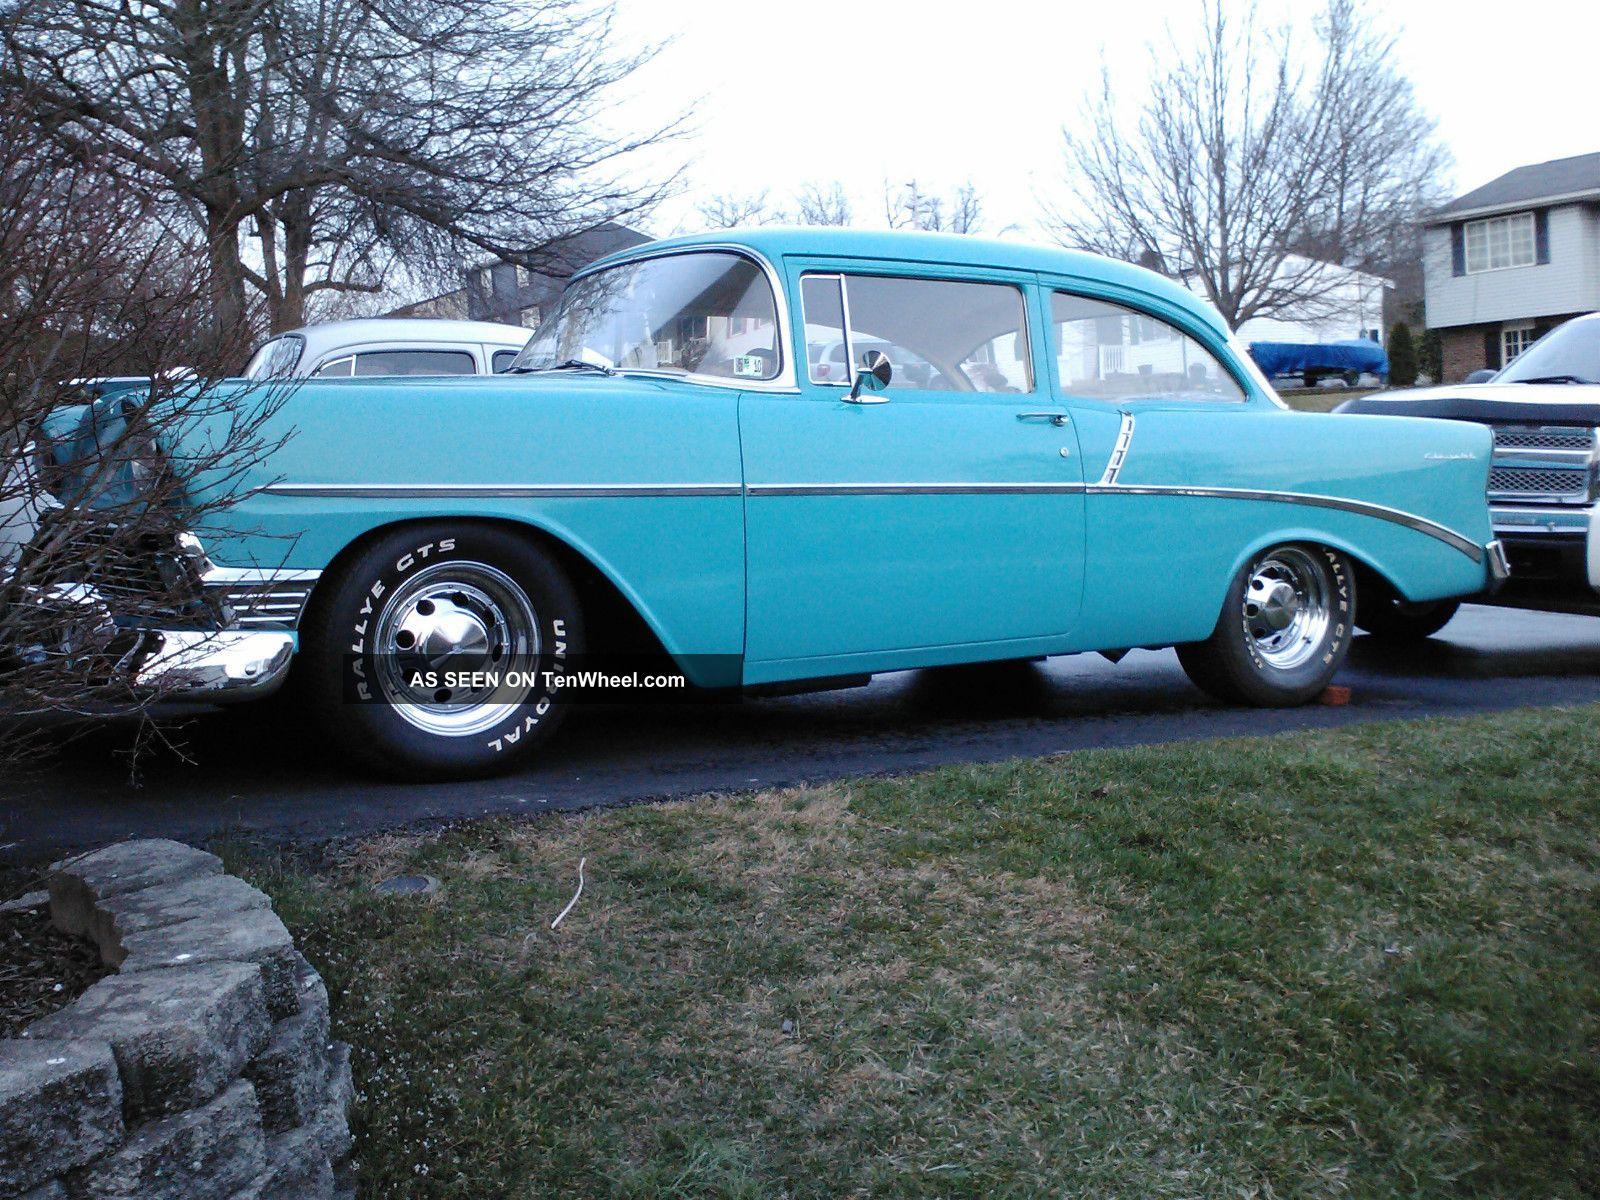 1956 Chevy 150 / 210 Blue 350 4 - Speed Bel Air/150/210 photo